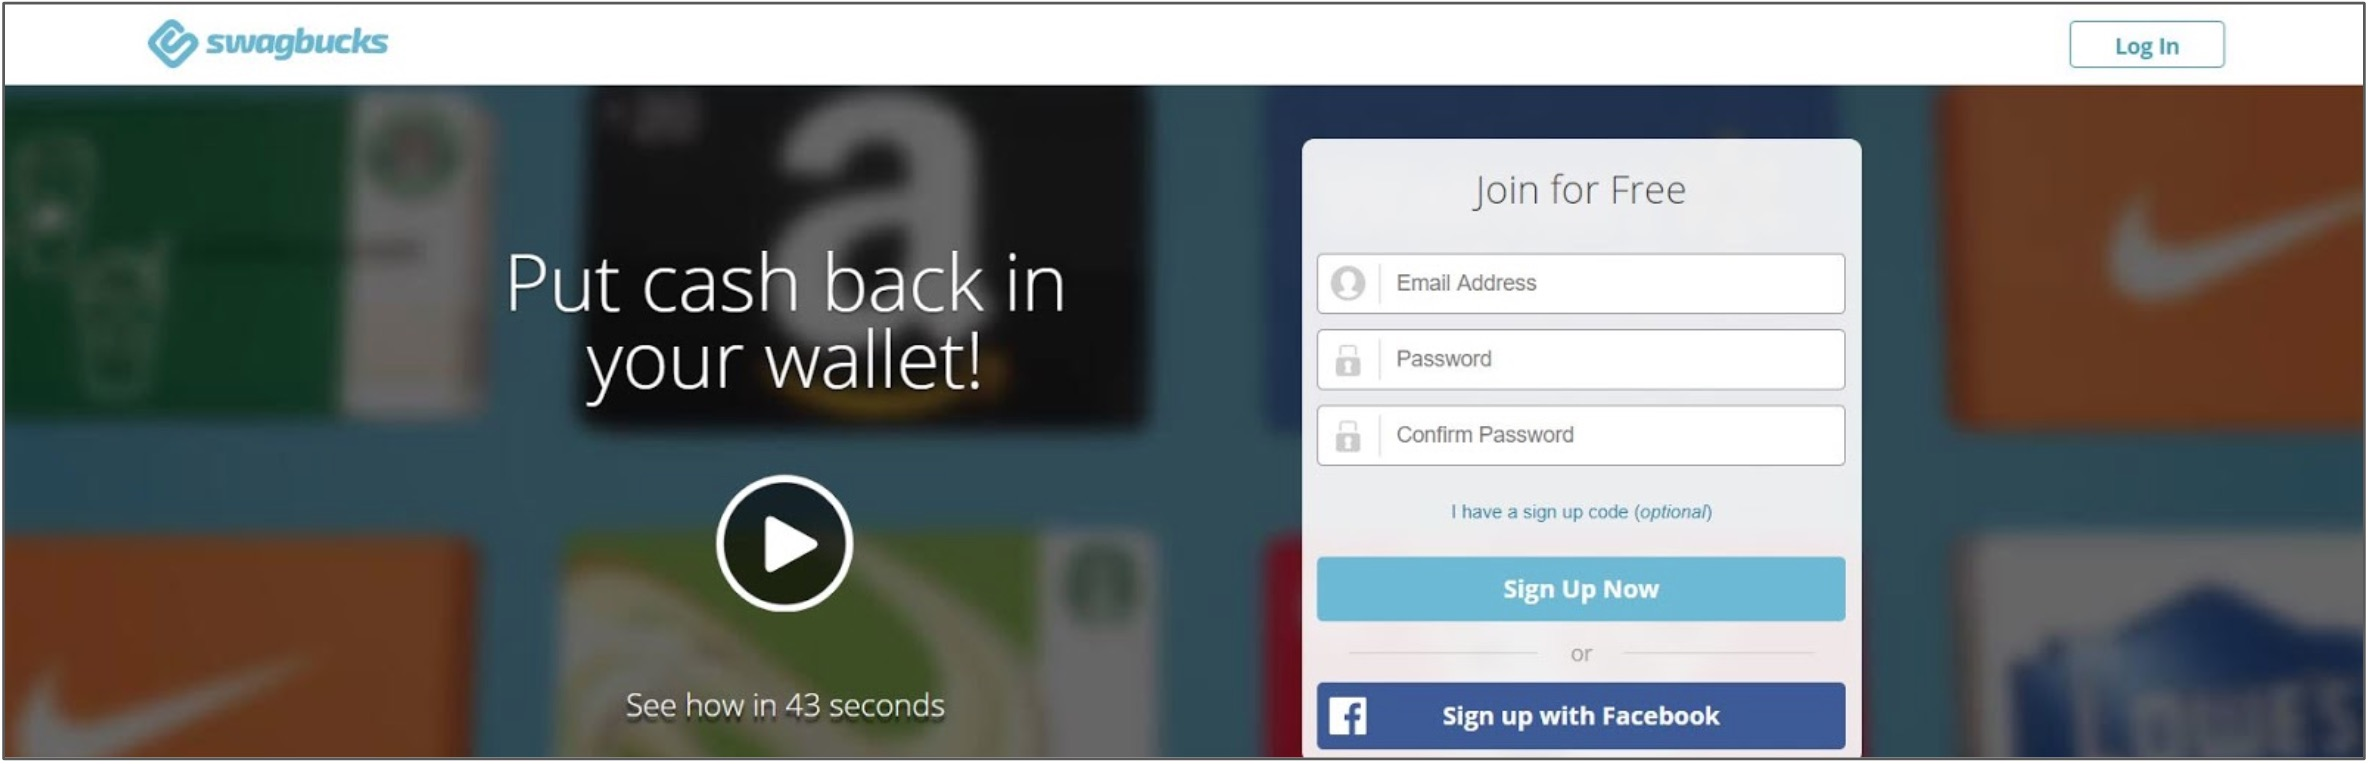 Screenshot of Swagbucks home page